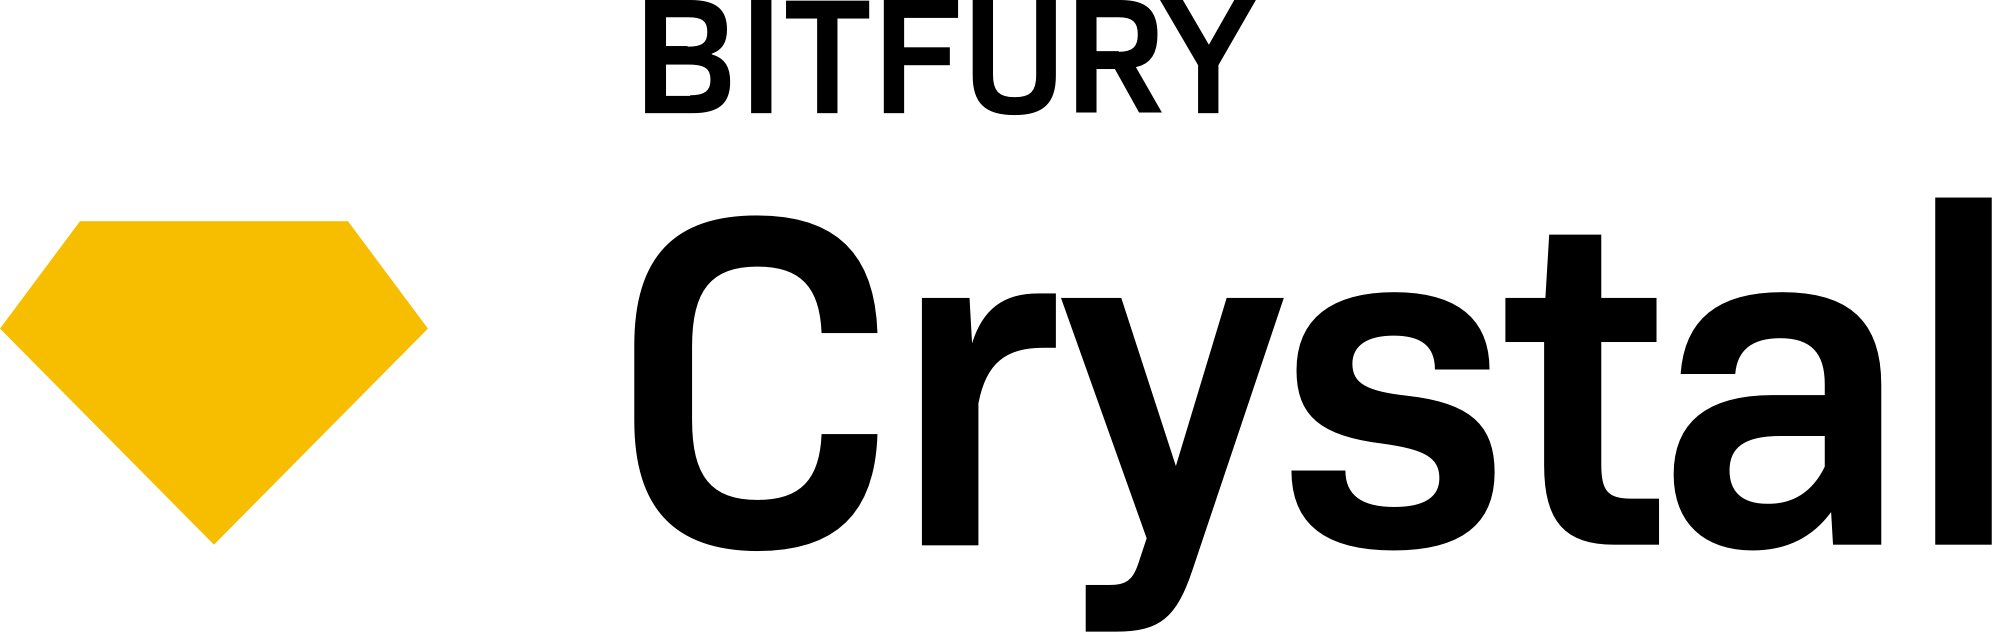 Crystal Blockchain Logo